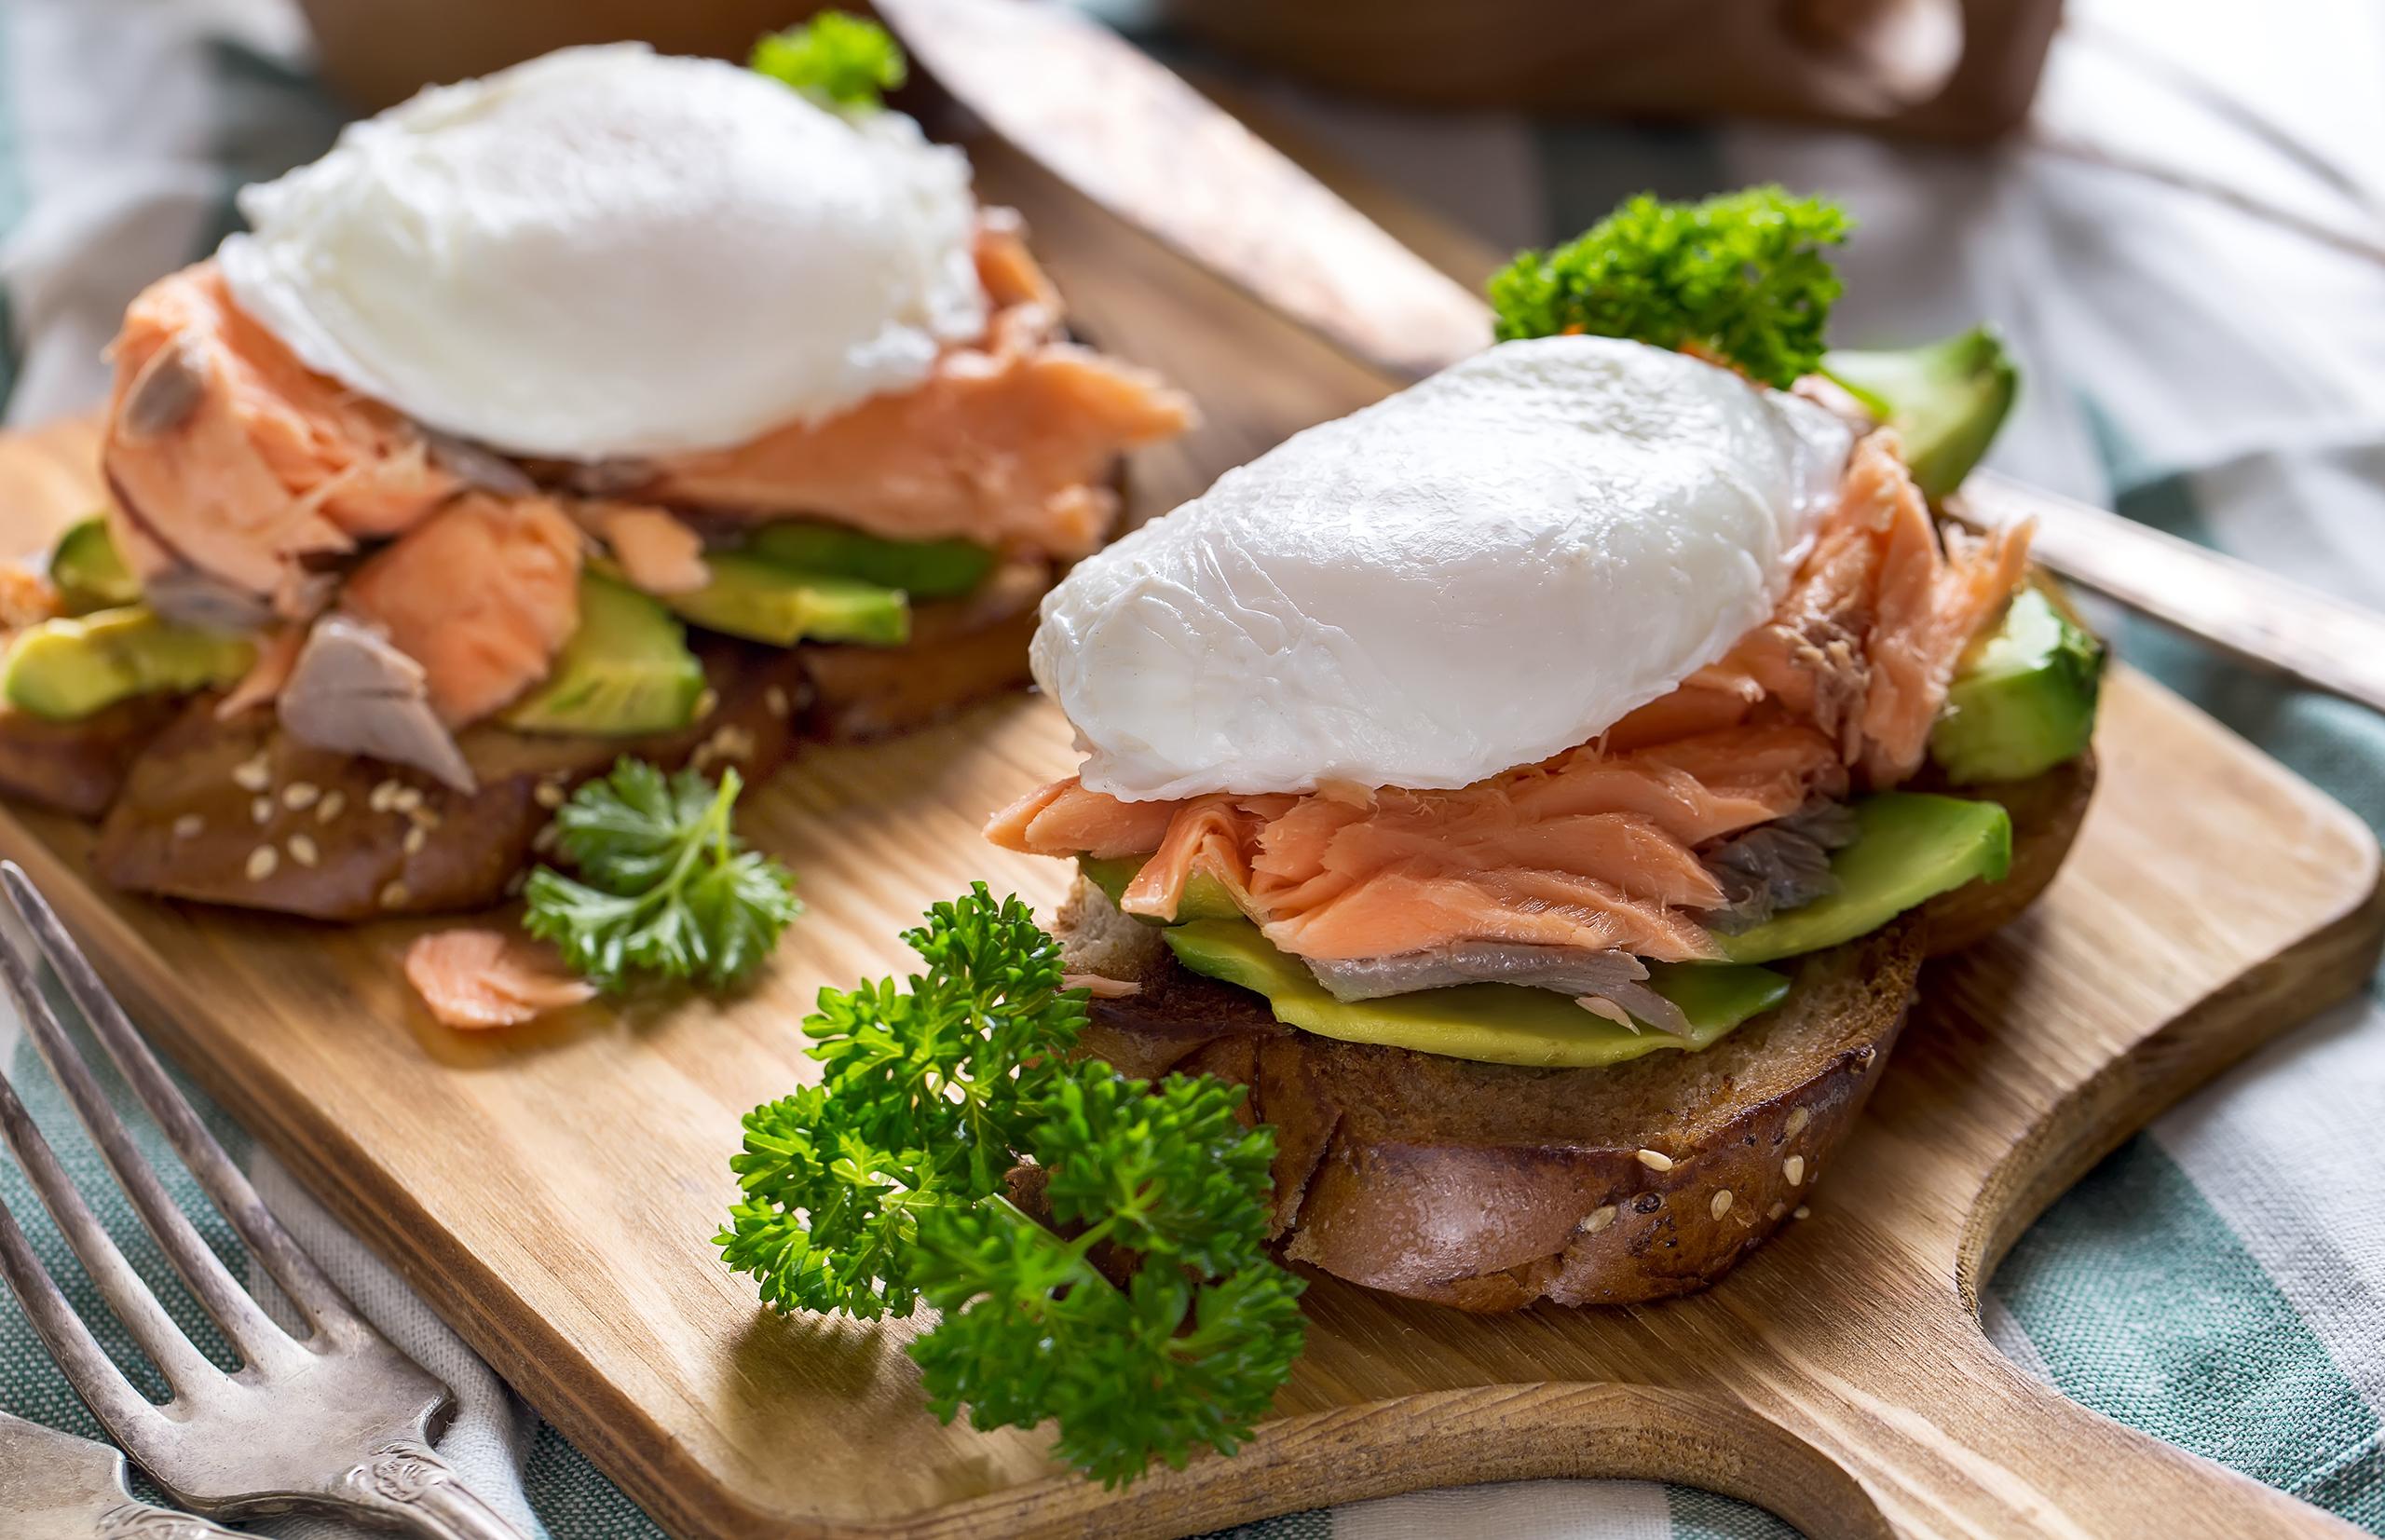 112th Street Diner's Breakfast Menu Specials Part 1